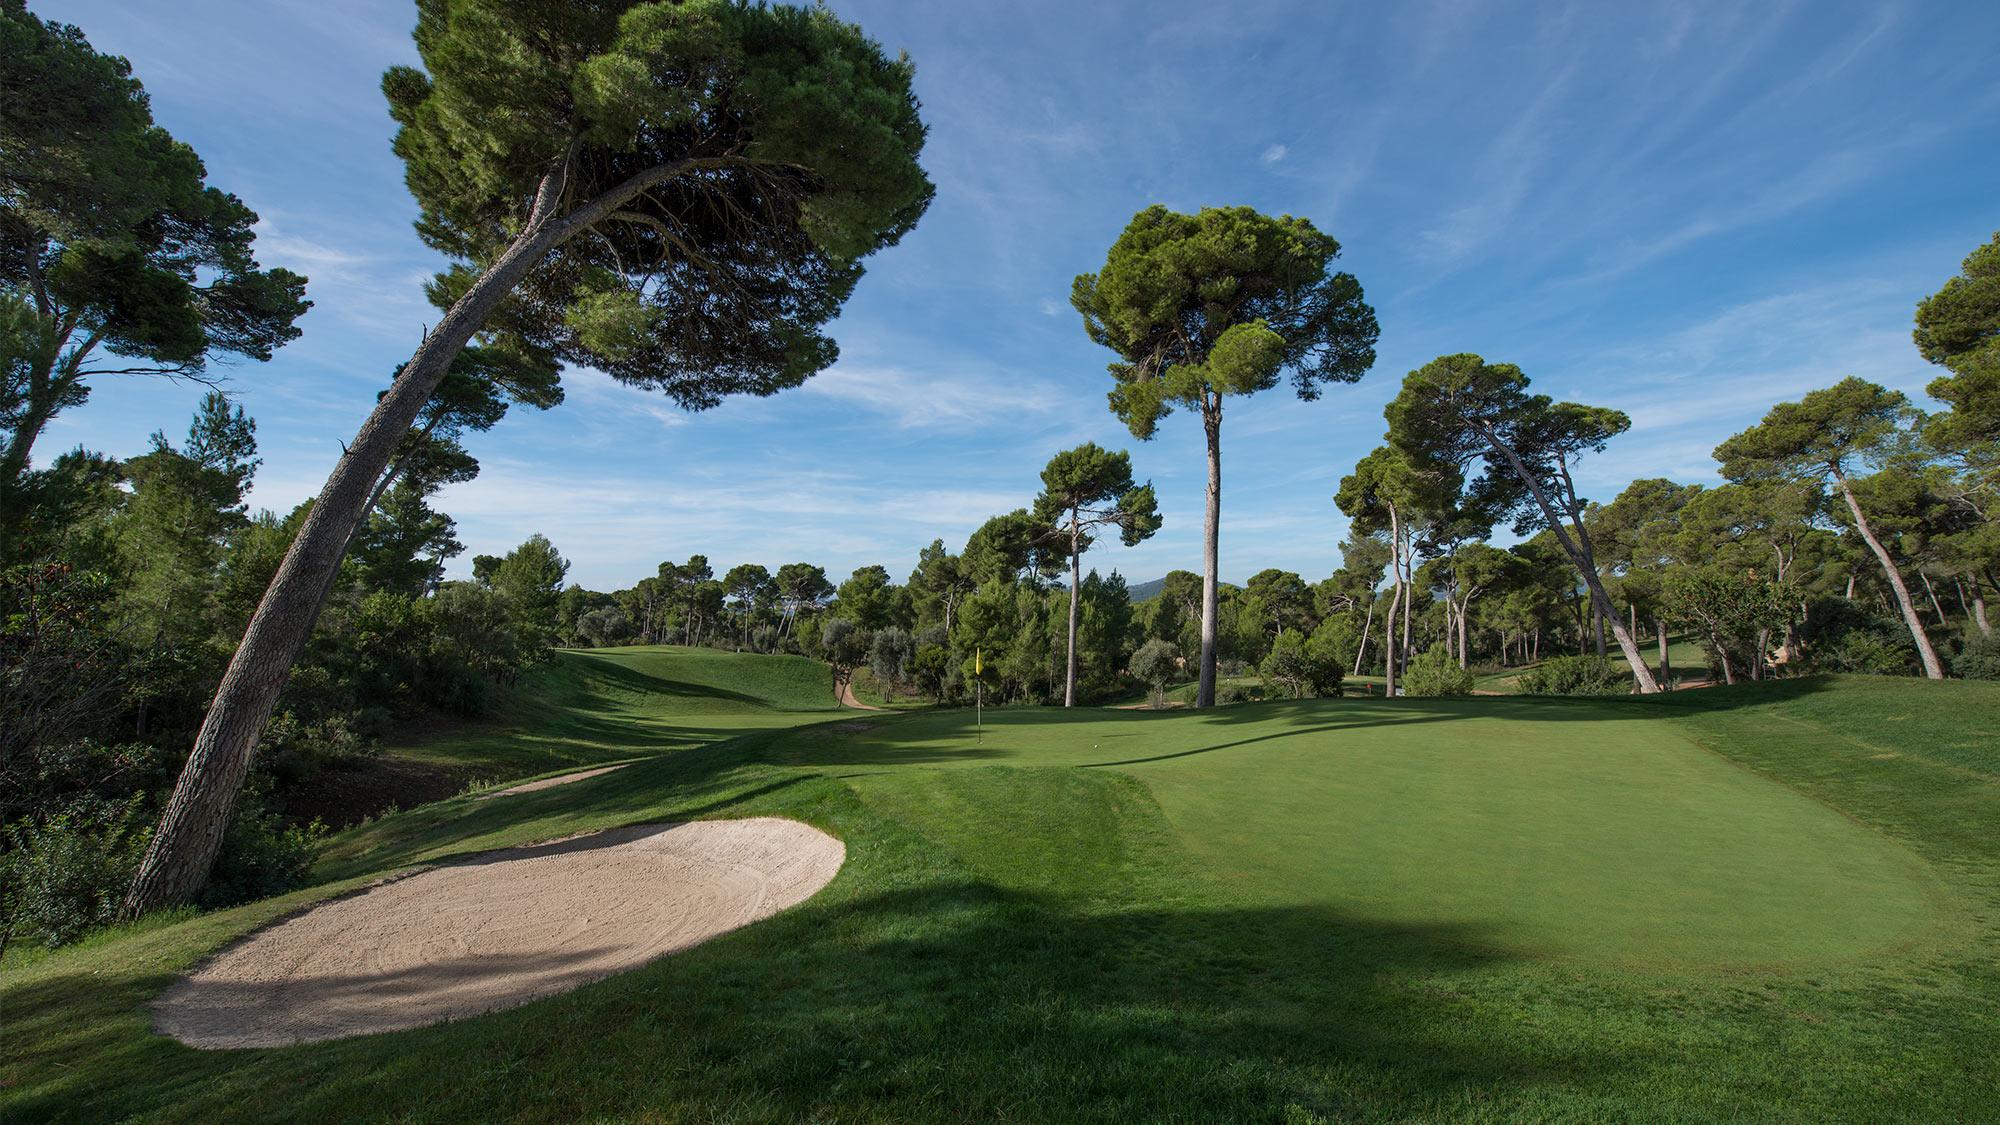 golf-son-servera-home-3 (1).jpg